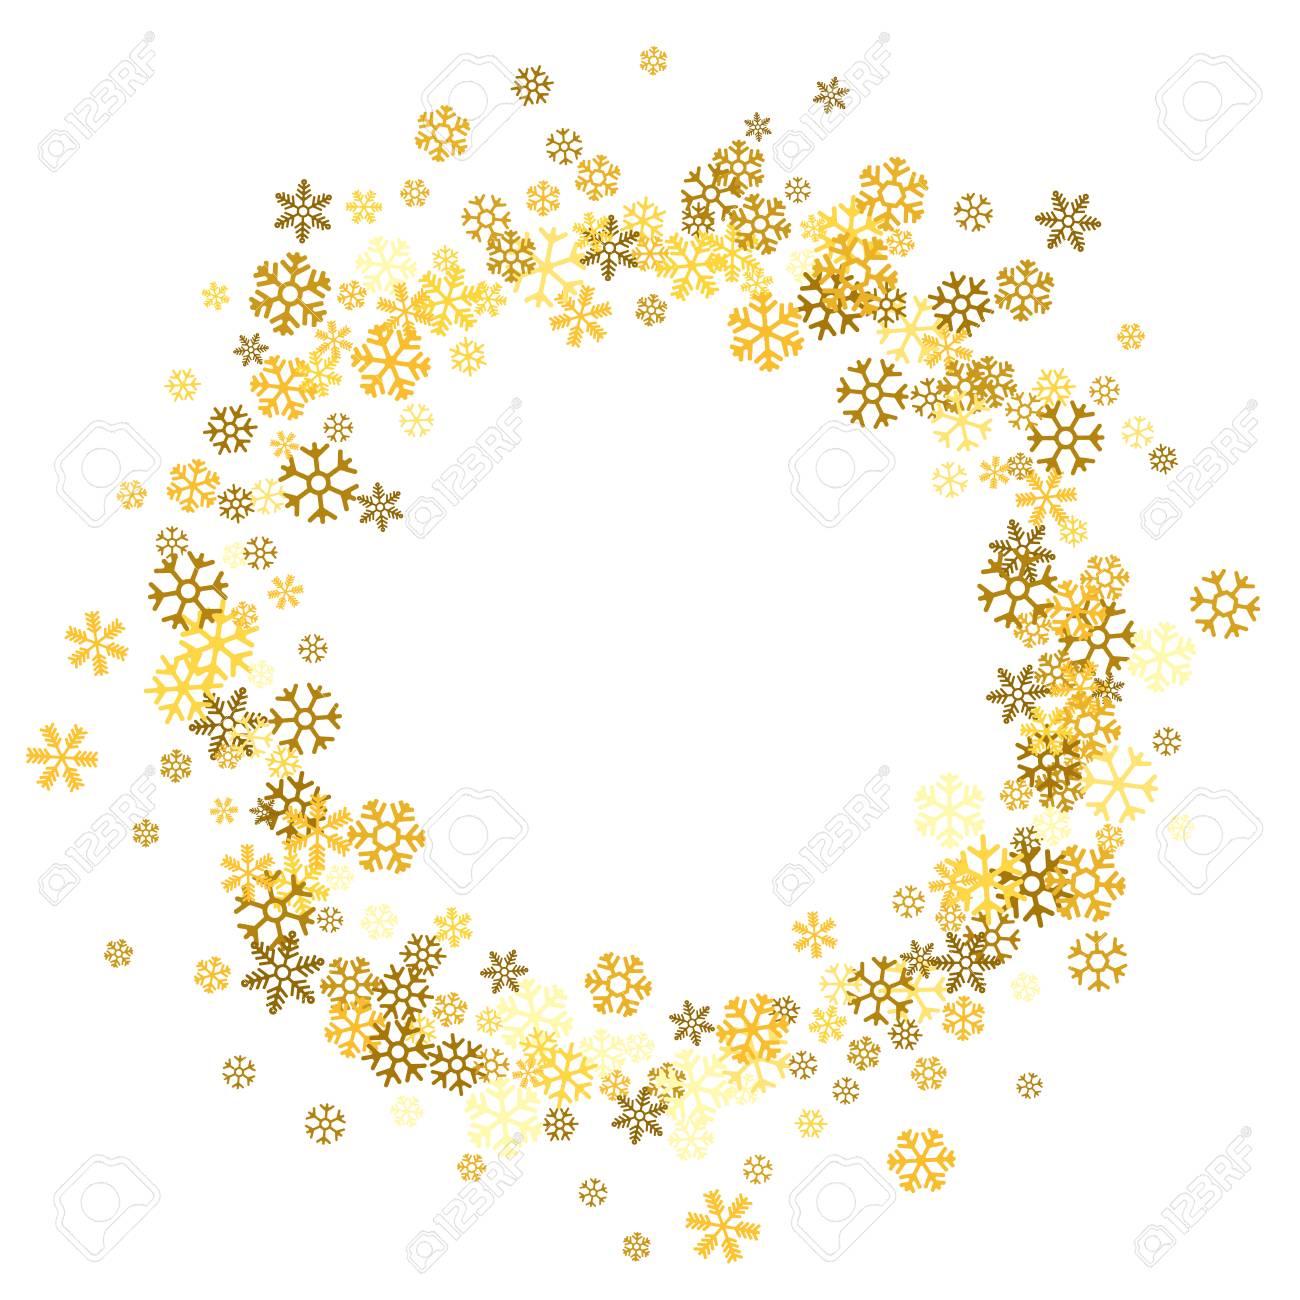 53a30e5cc2e Round gold frame or border of random scatter golden snowflakes on white  background. Design element